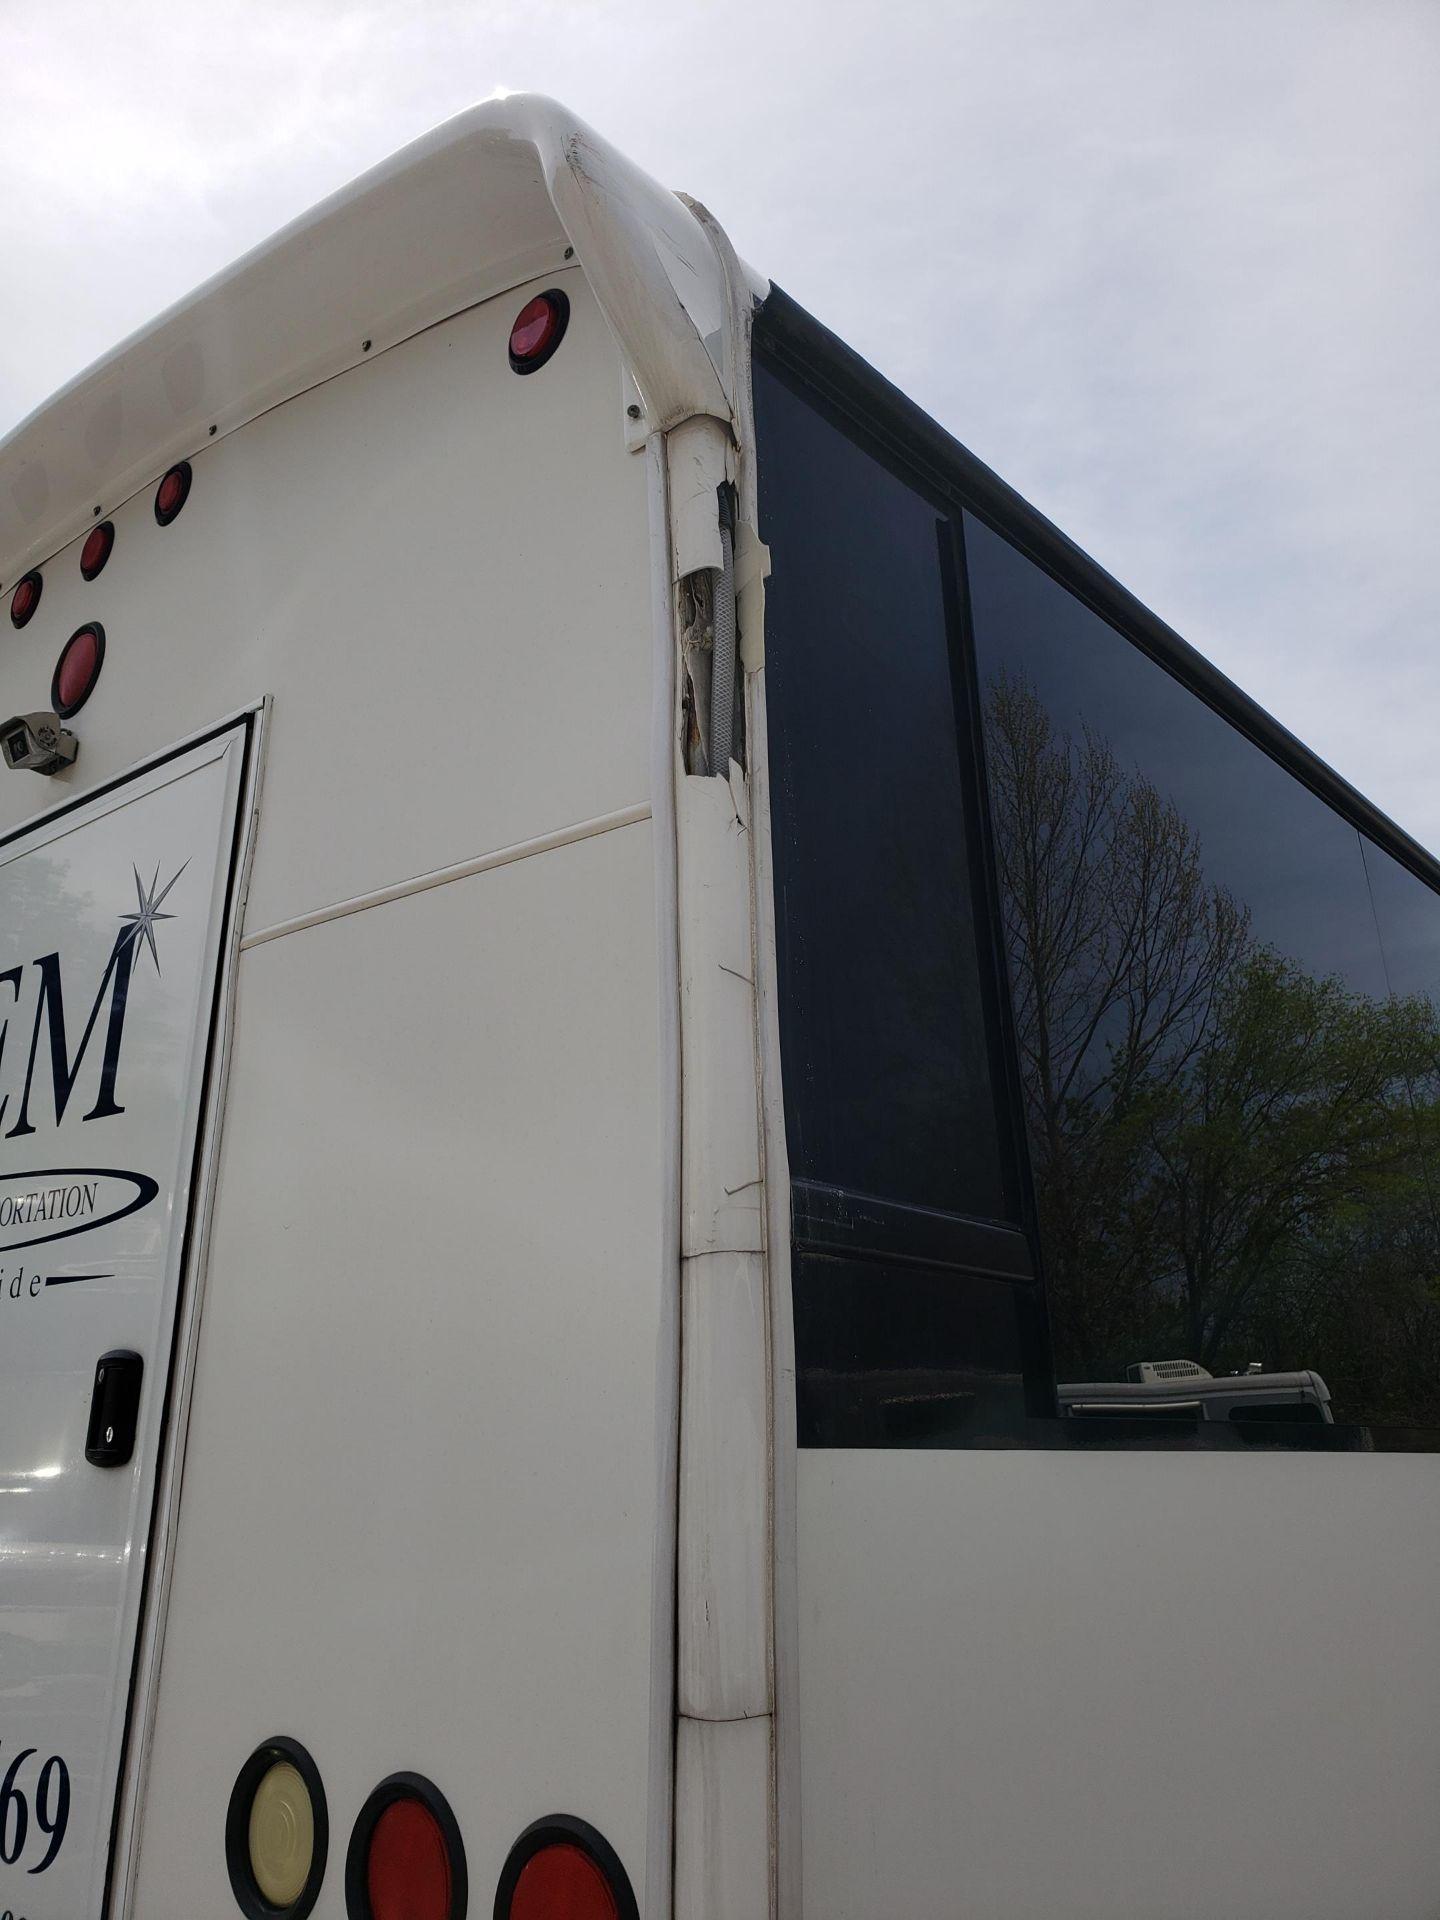 2013 Freightliner M2 106 33-Pass Champion Defender Shuttle Bus - Image 16 of 17